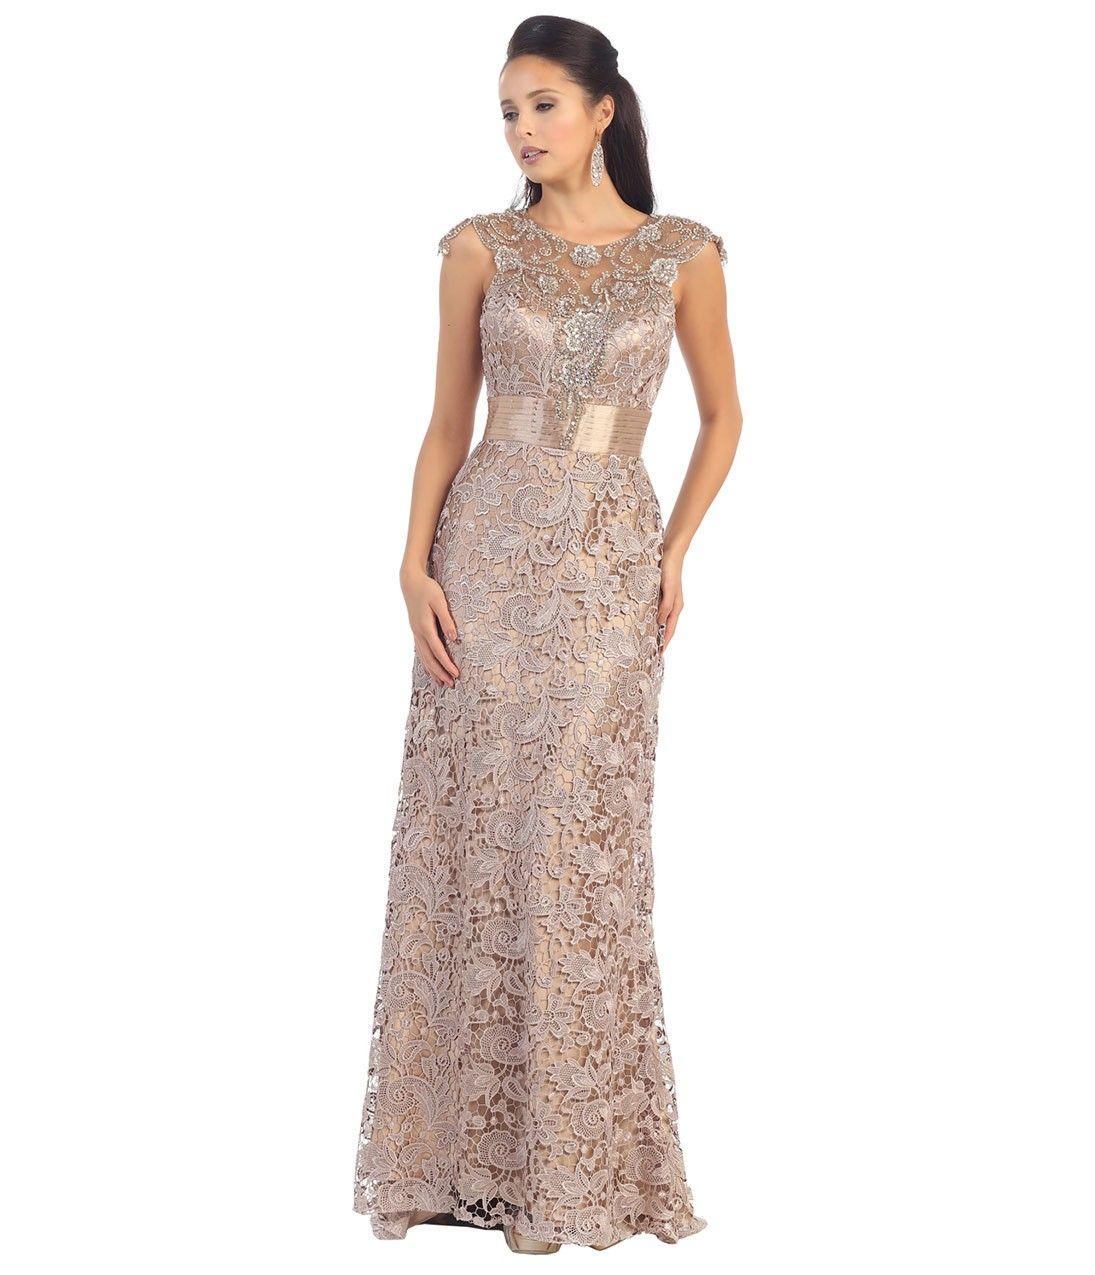 Taupe lace dress plus size